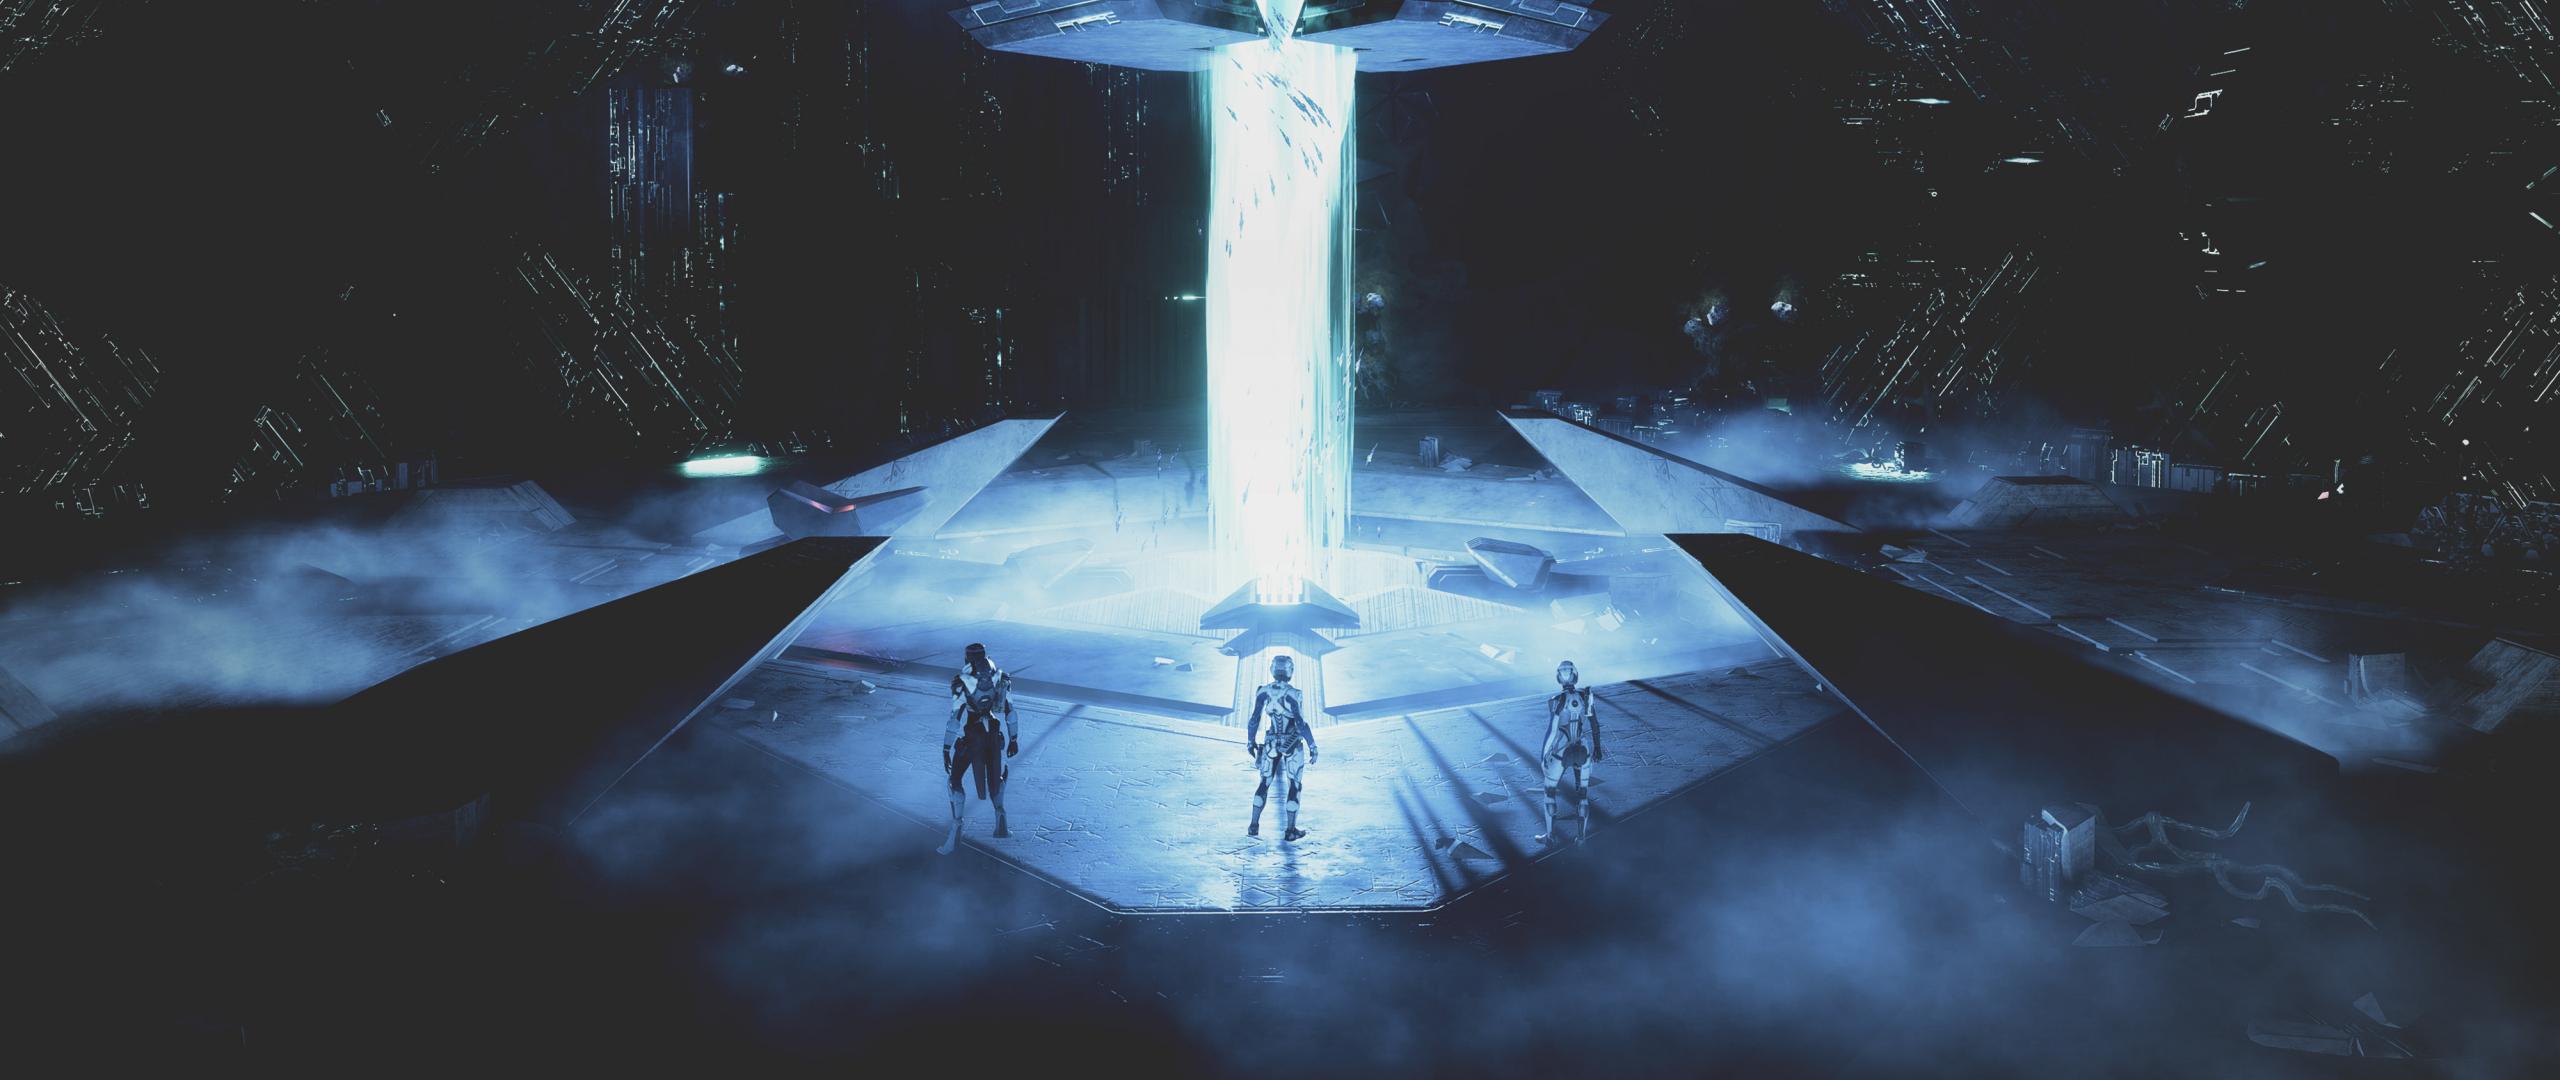 Download 2560x1080 Wallpaper Mass Effect Andromeda